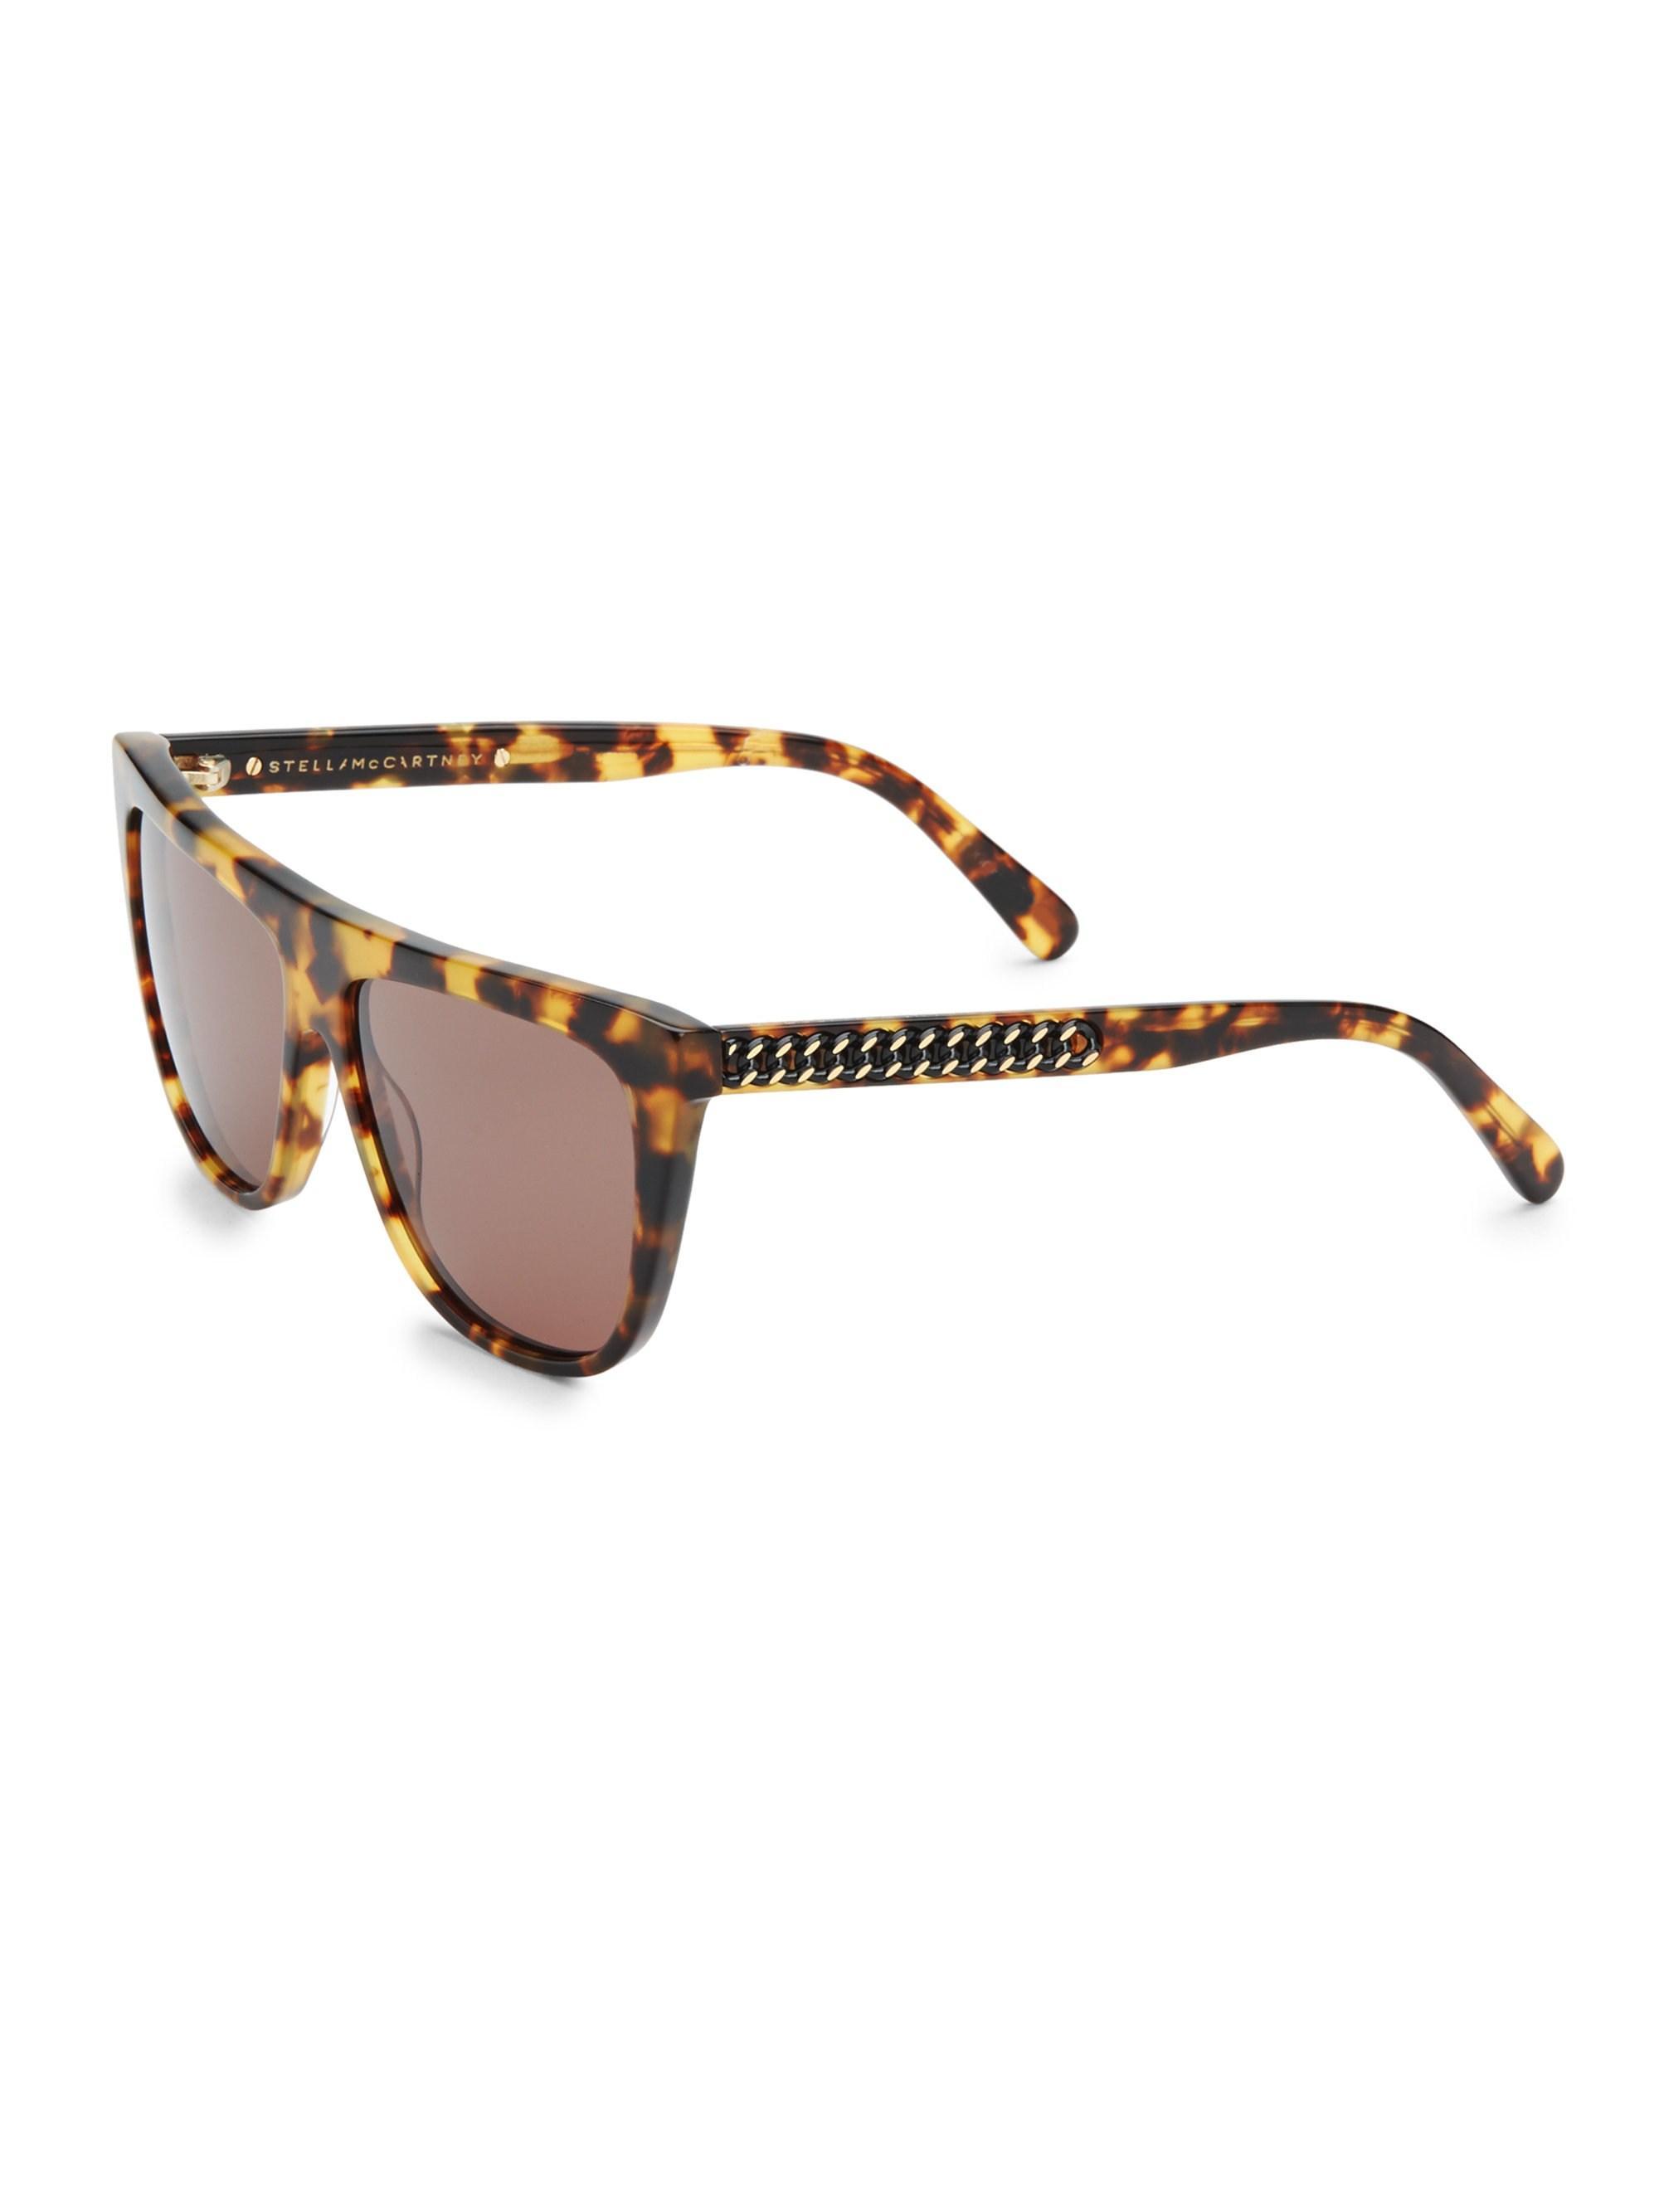 57011a0d26 Stella McCartney - Multicolor 56mm Tortoiseshell Shield Sunglasses - Lyst.  View fullscreen